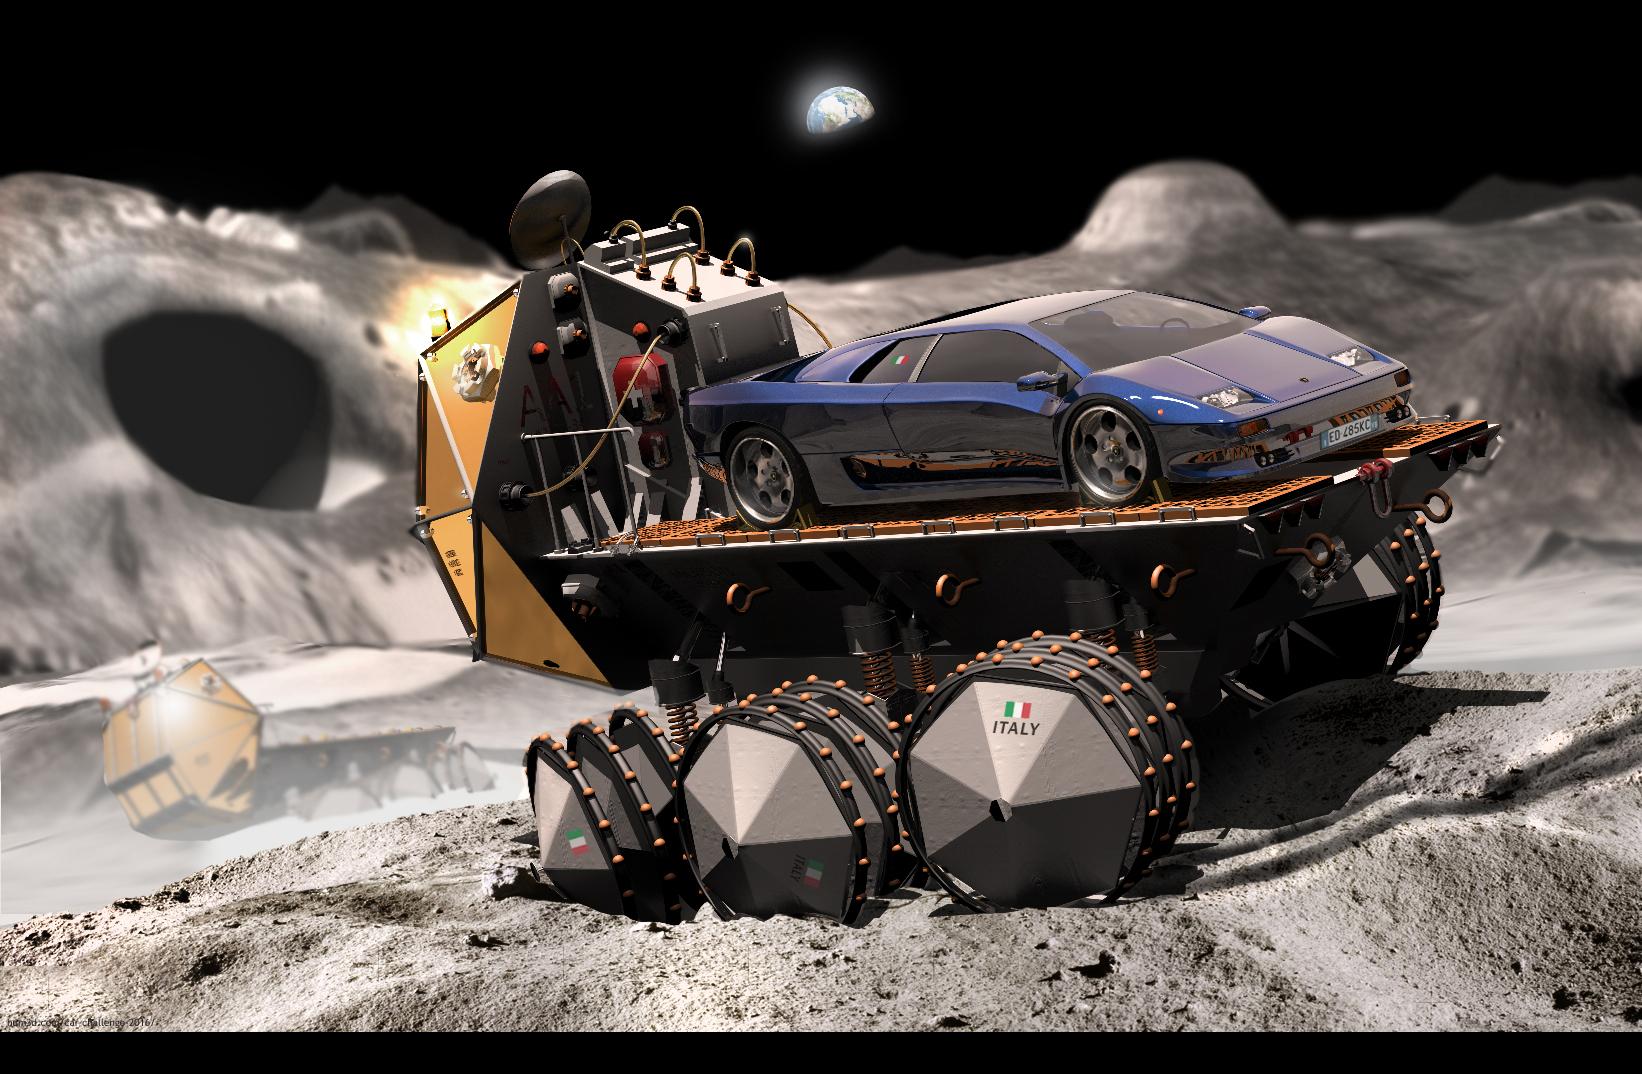 Lamborghini Diablo transportation